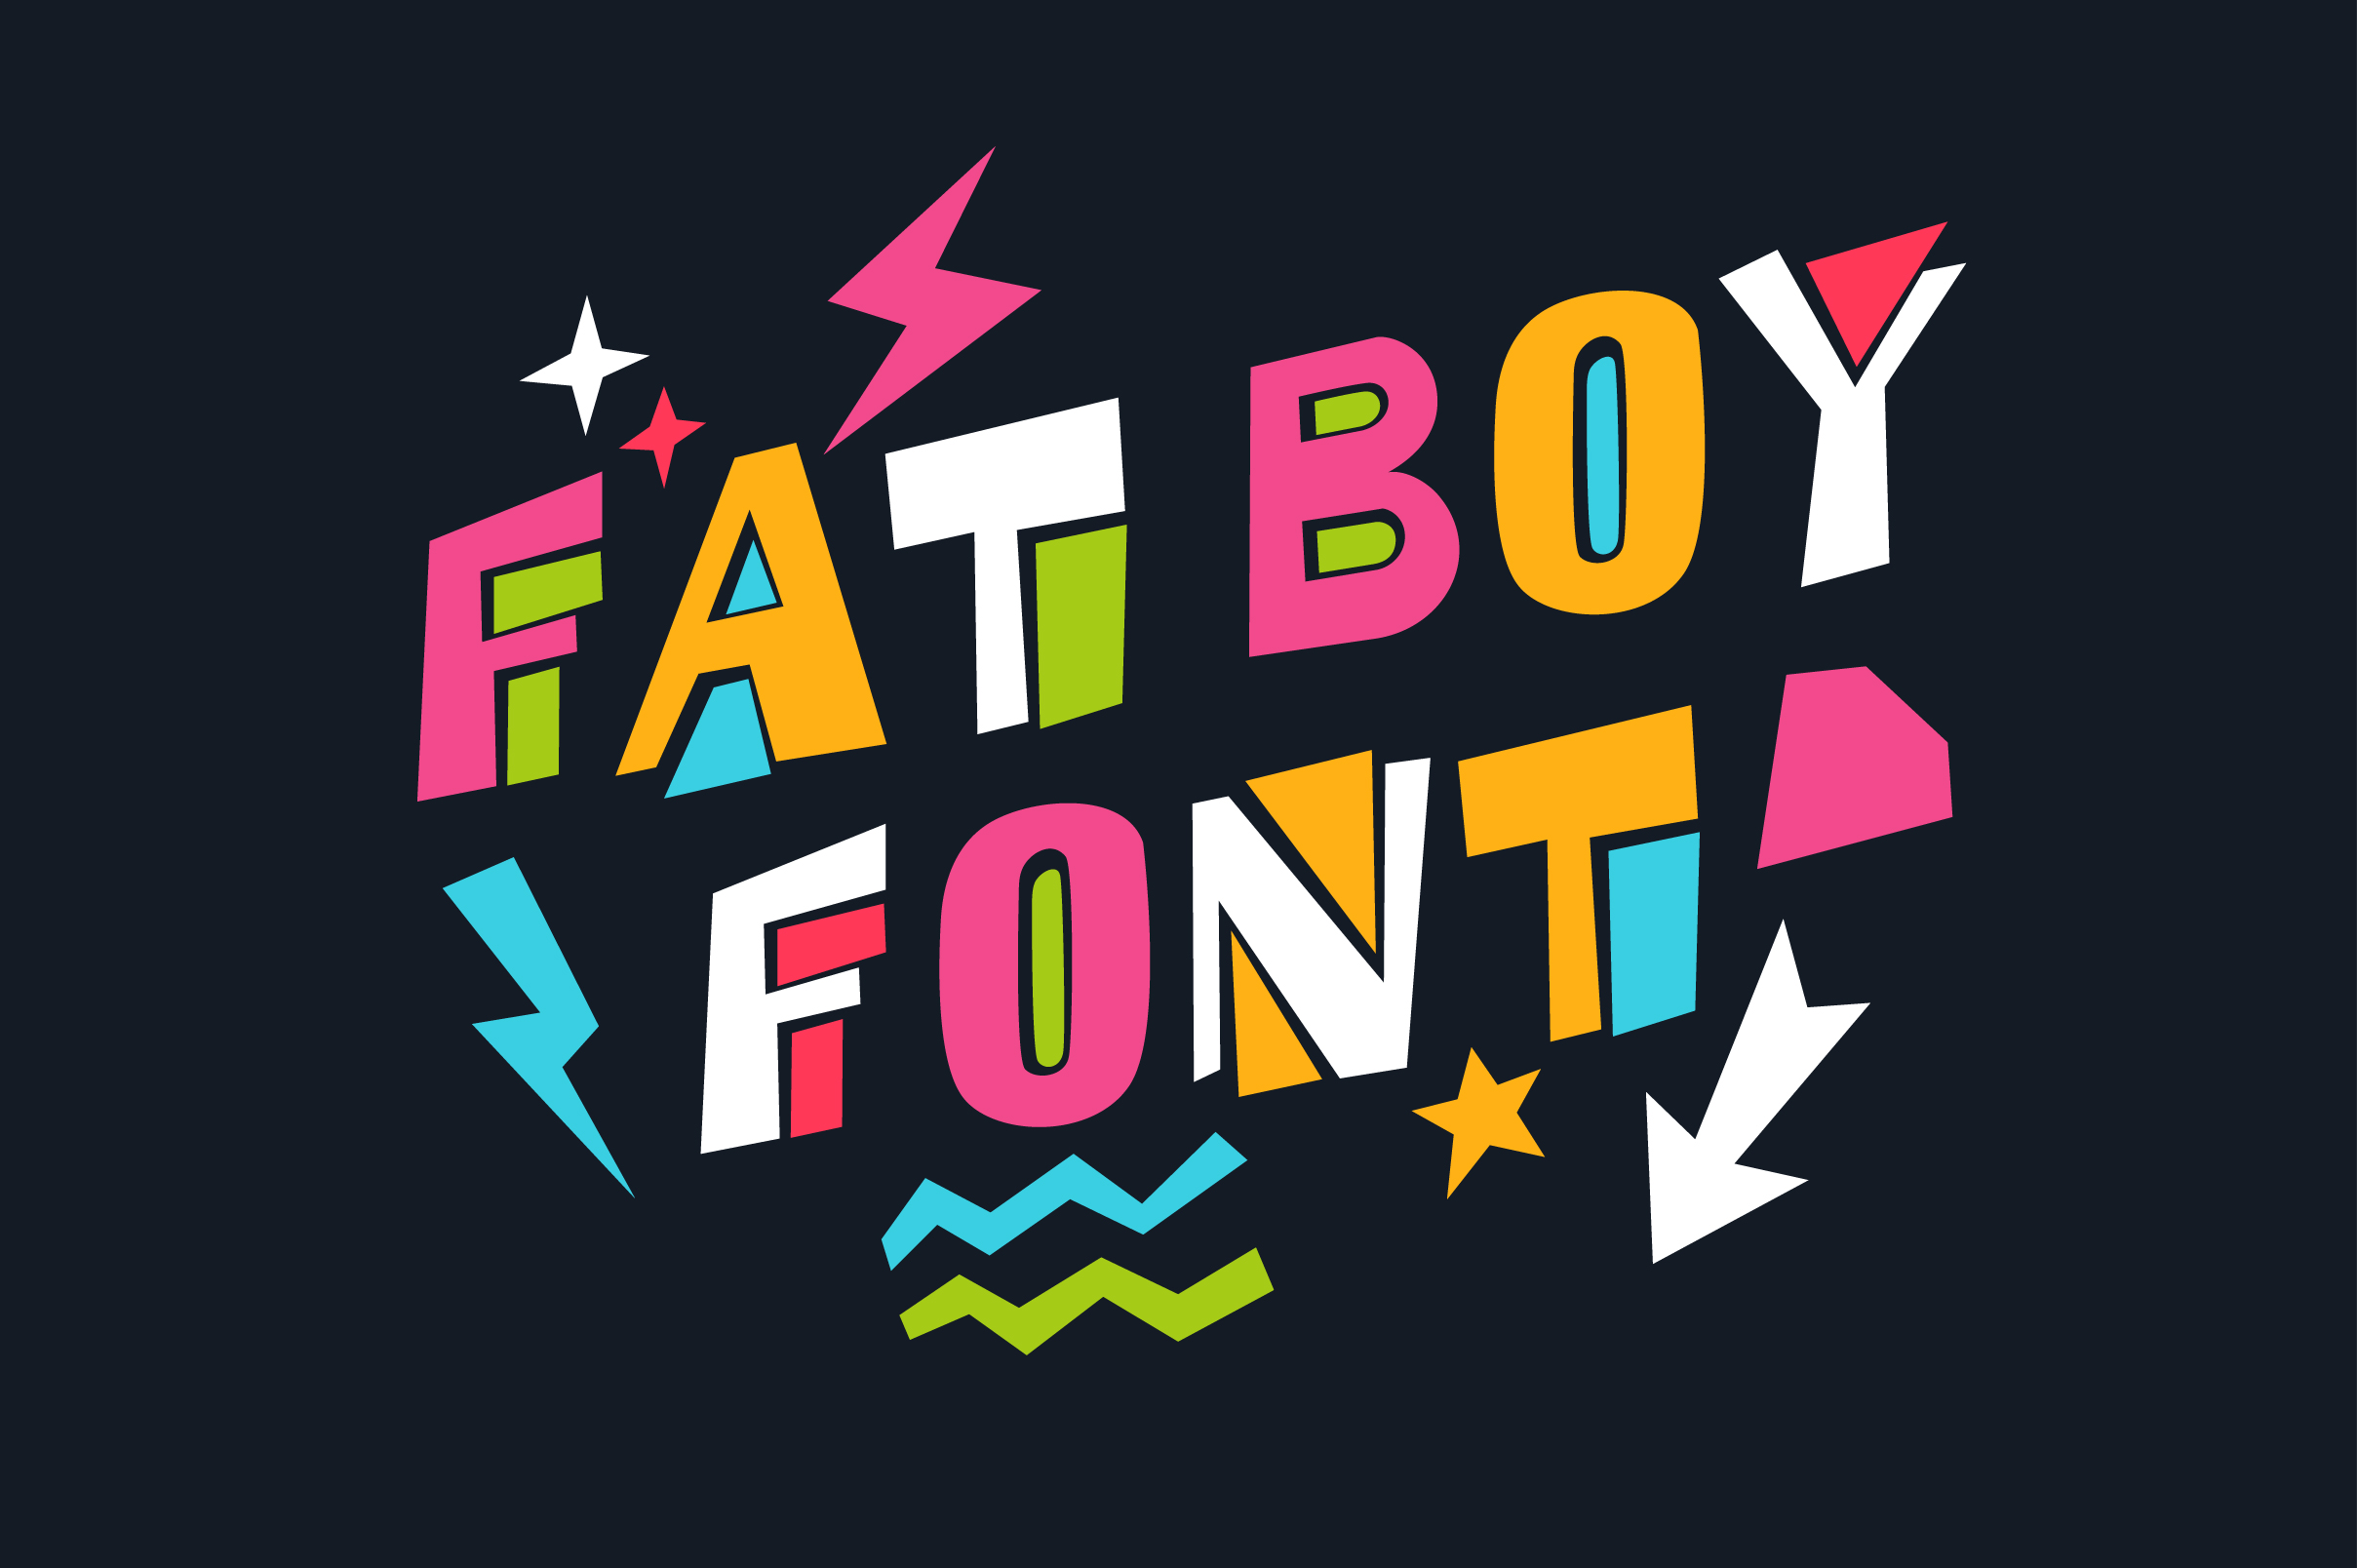 FAT BOY example image 1